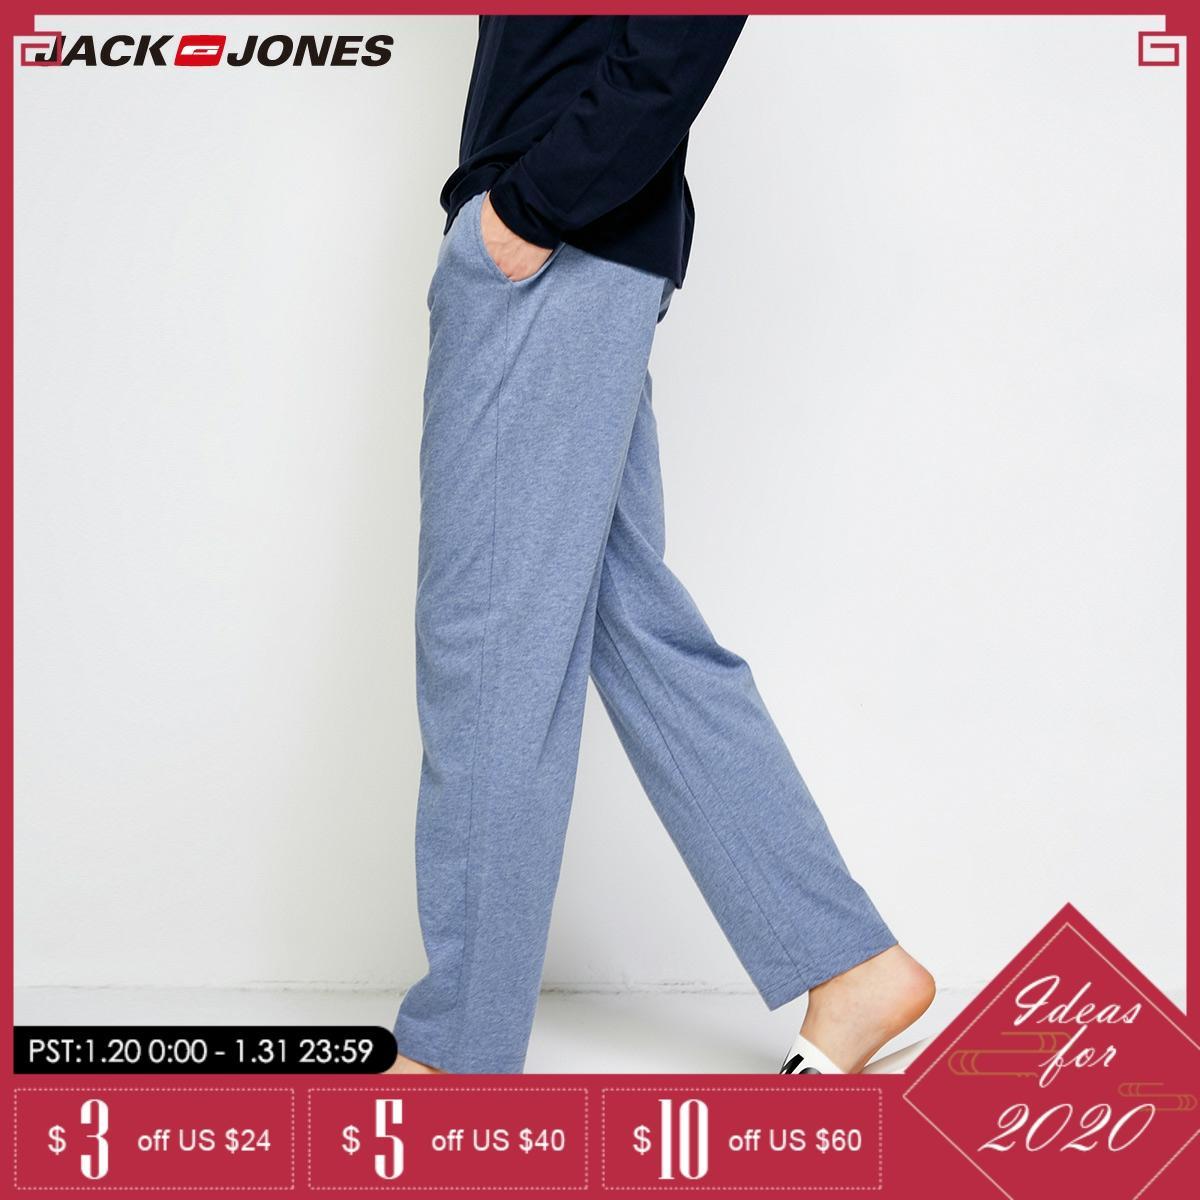 Jack Jones Spring Summer New Men's 100% Cotton Sweatpants Men Trousers Track Pants | 2183HC503